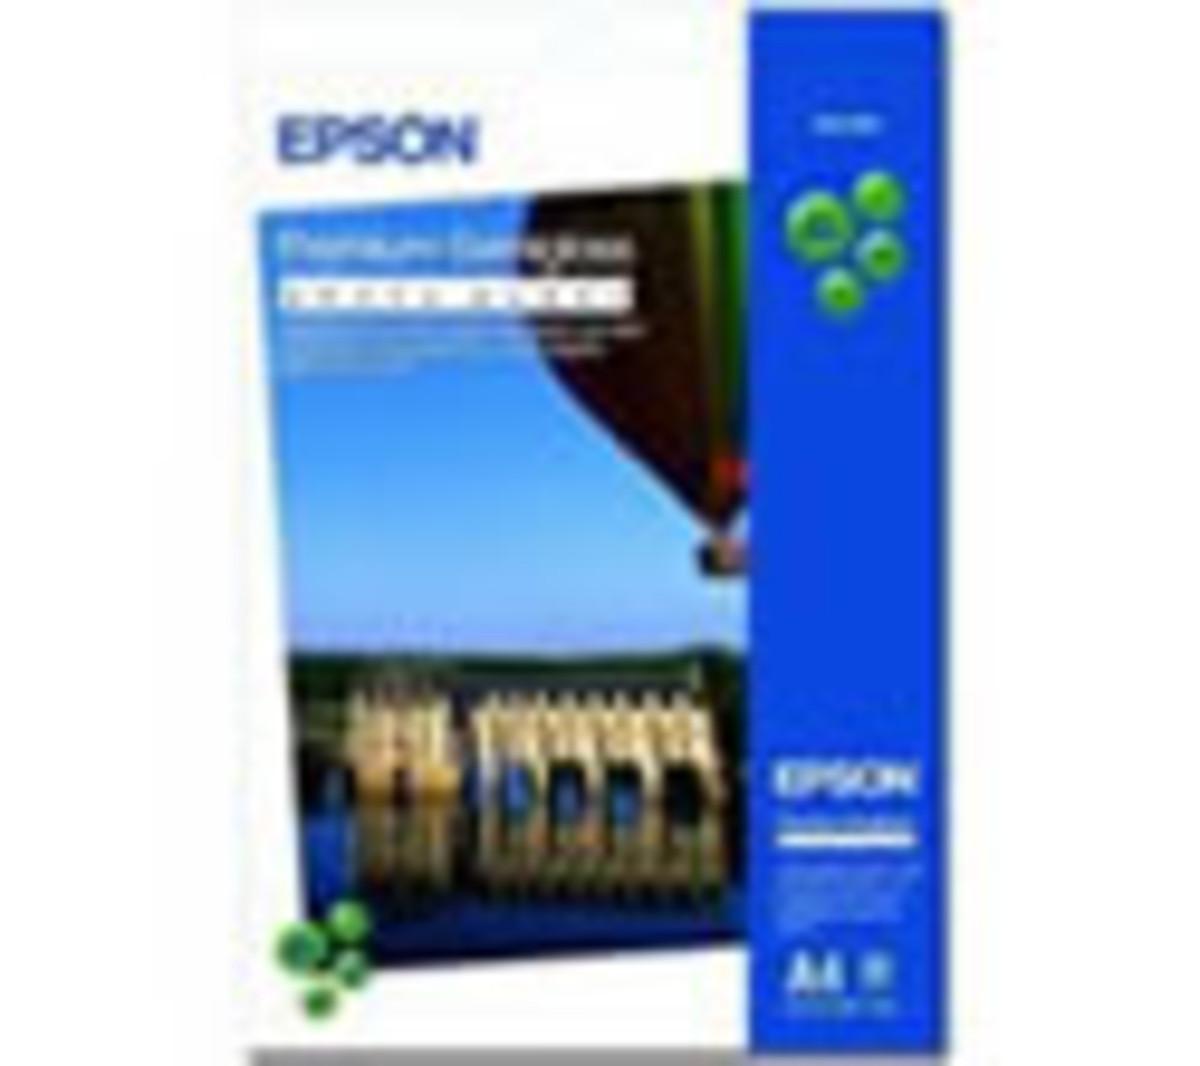 Epson Premium Semigloss Photo Paper A4 20 Sheets 251gsm